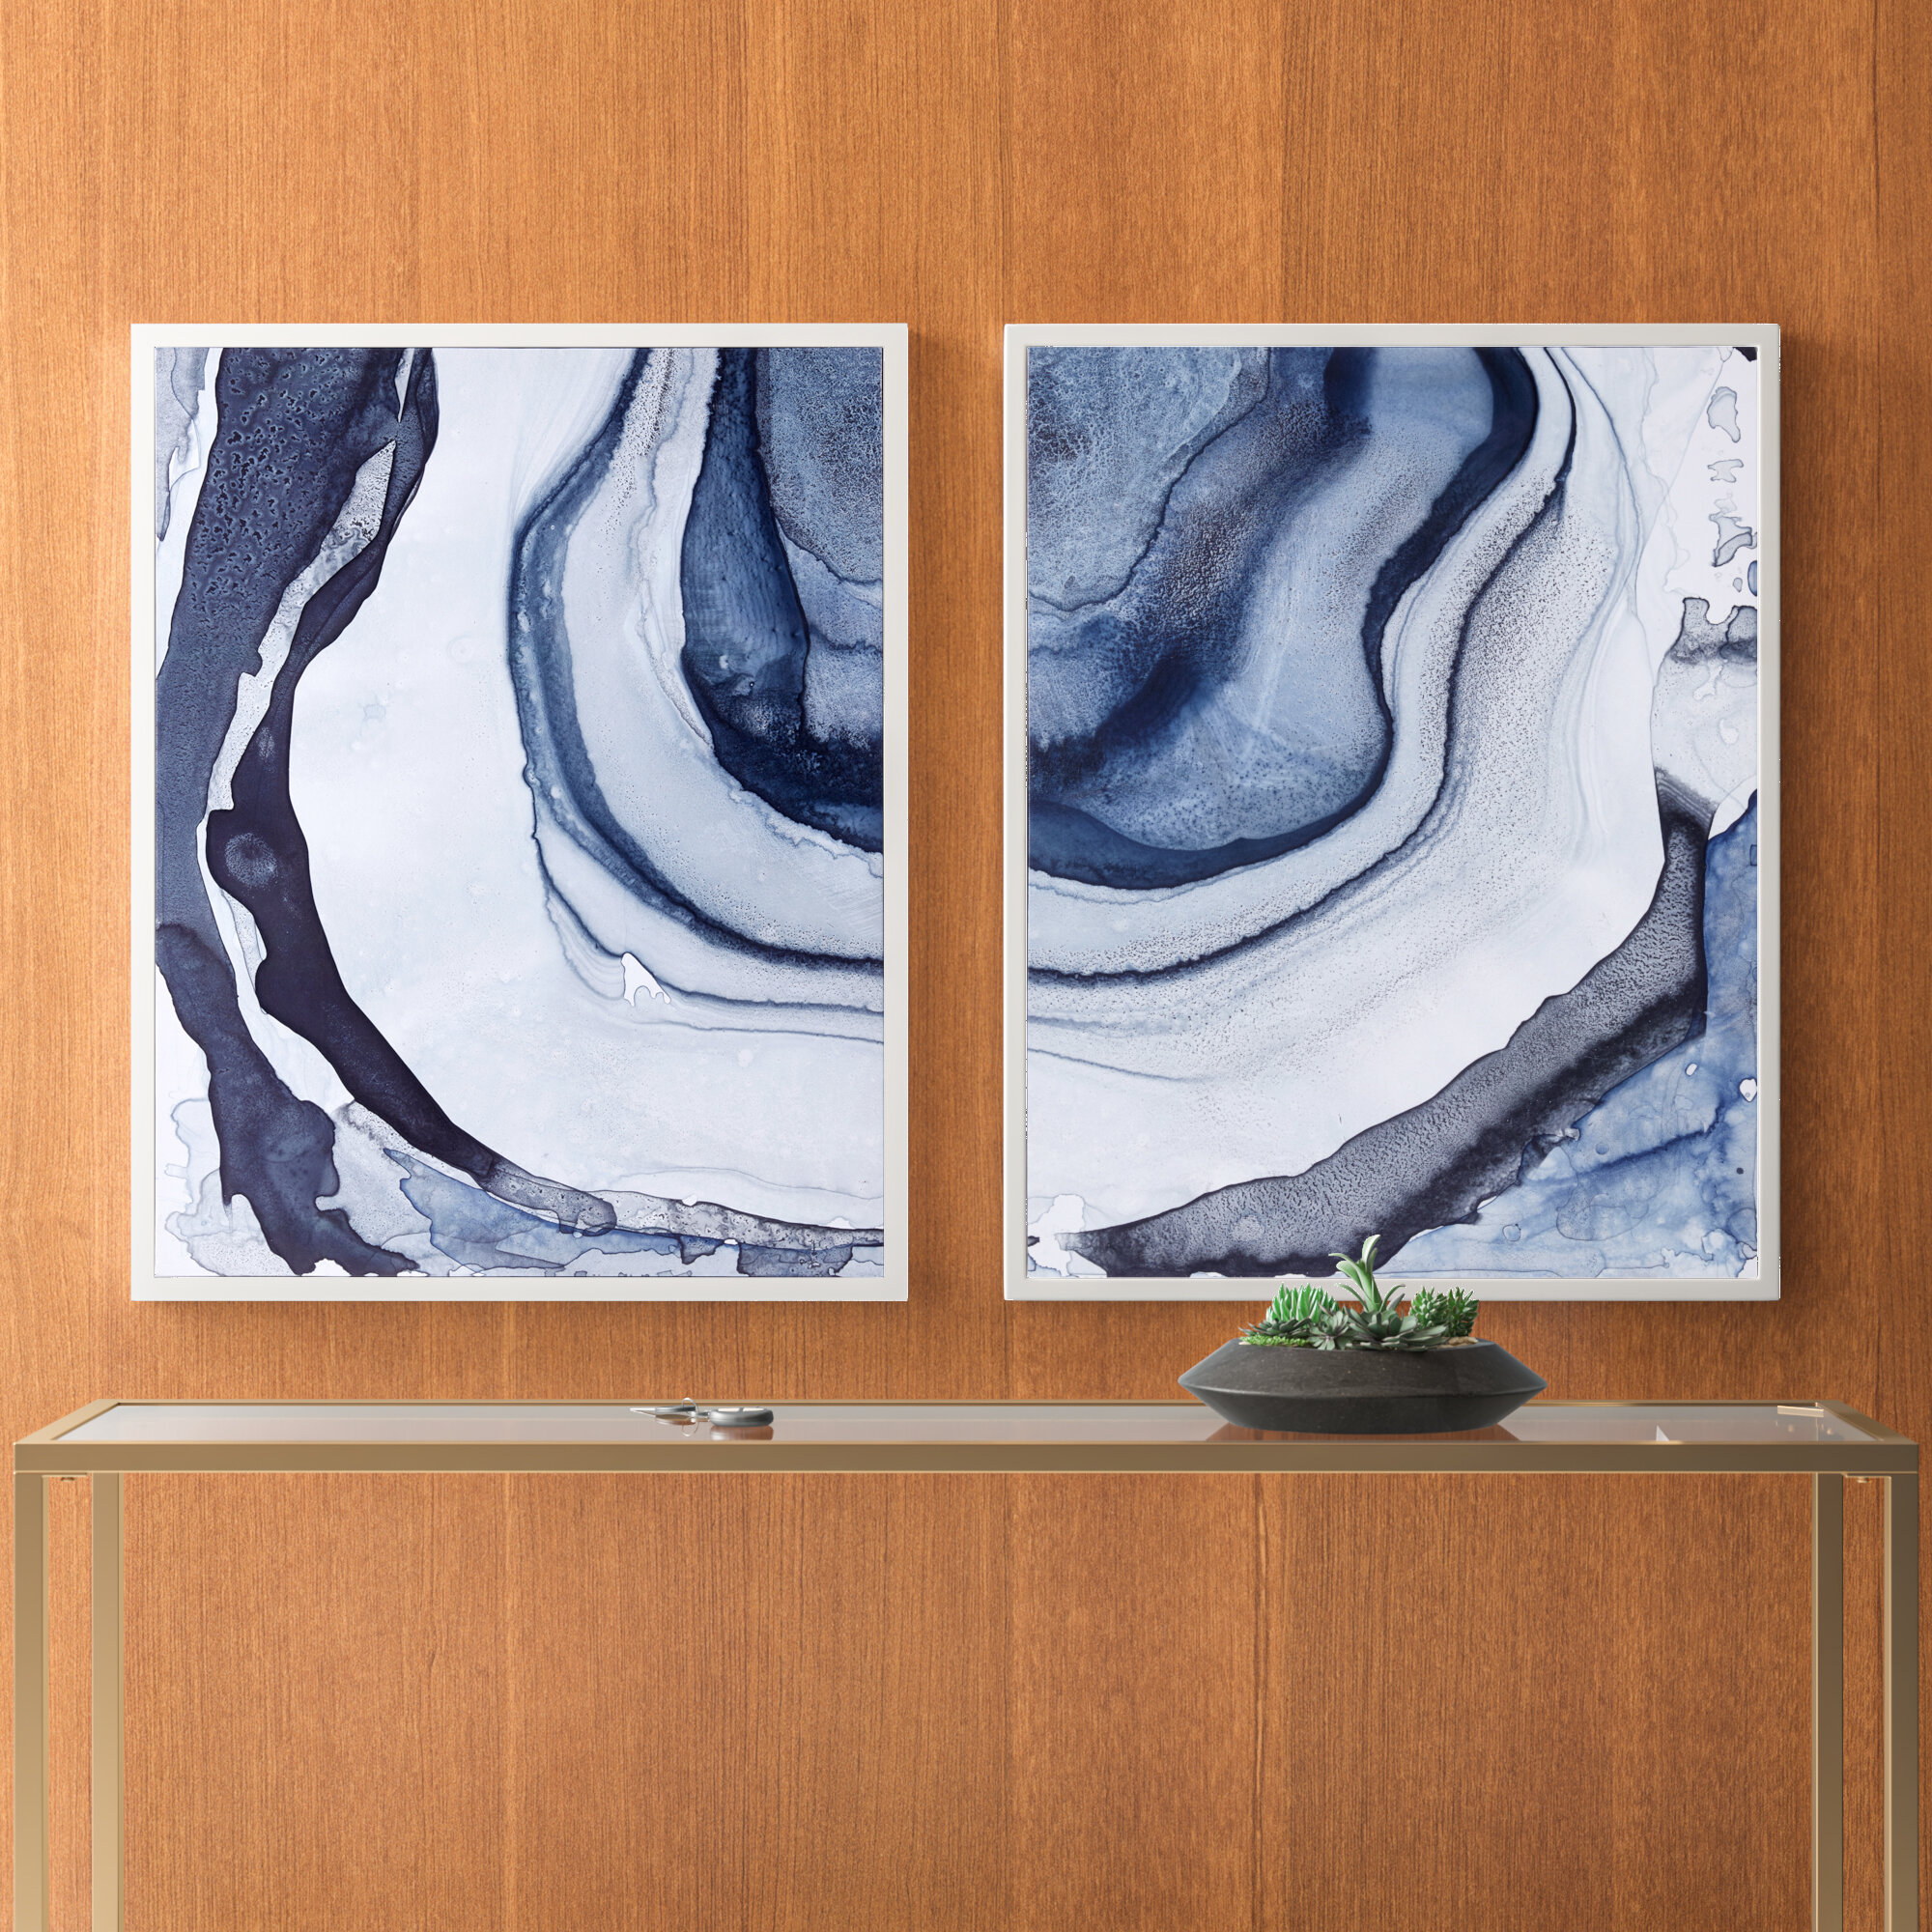 Black Streaks Abstract Room Artwork Print 2 Piece Framed Canvas Wall Art Set